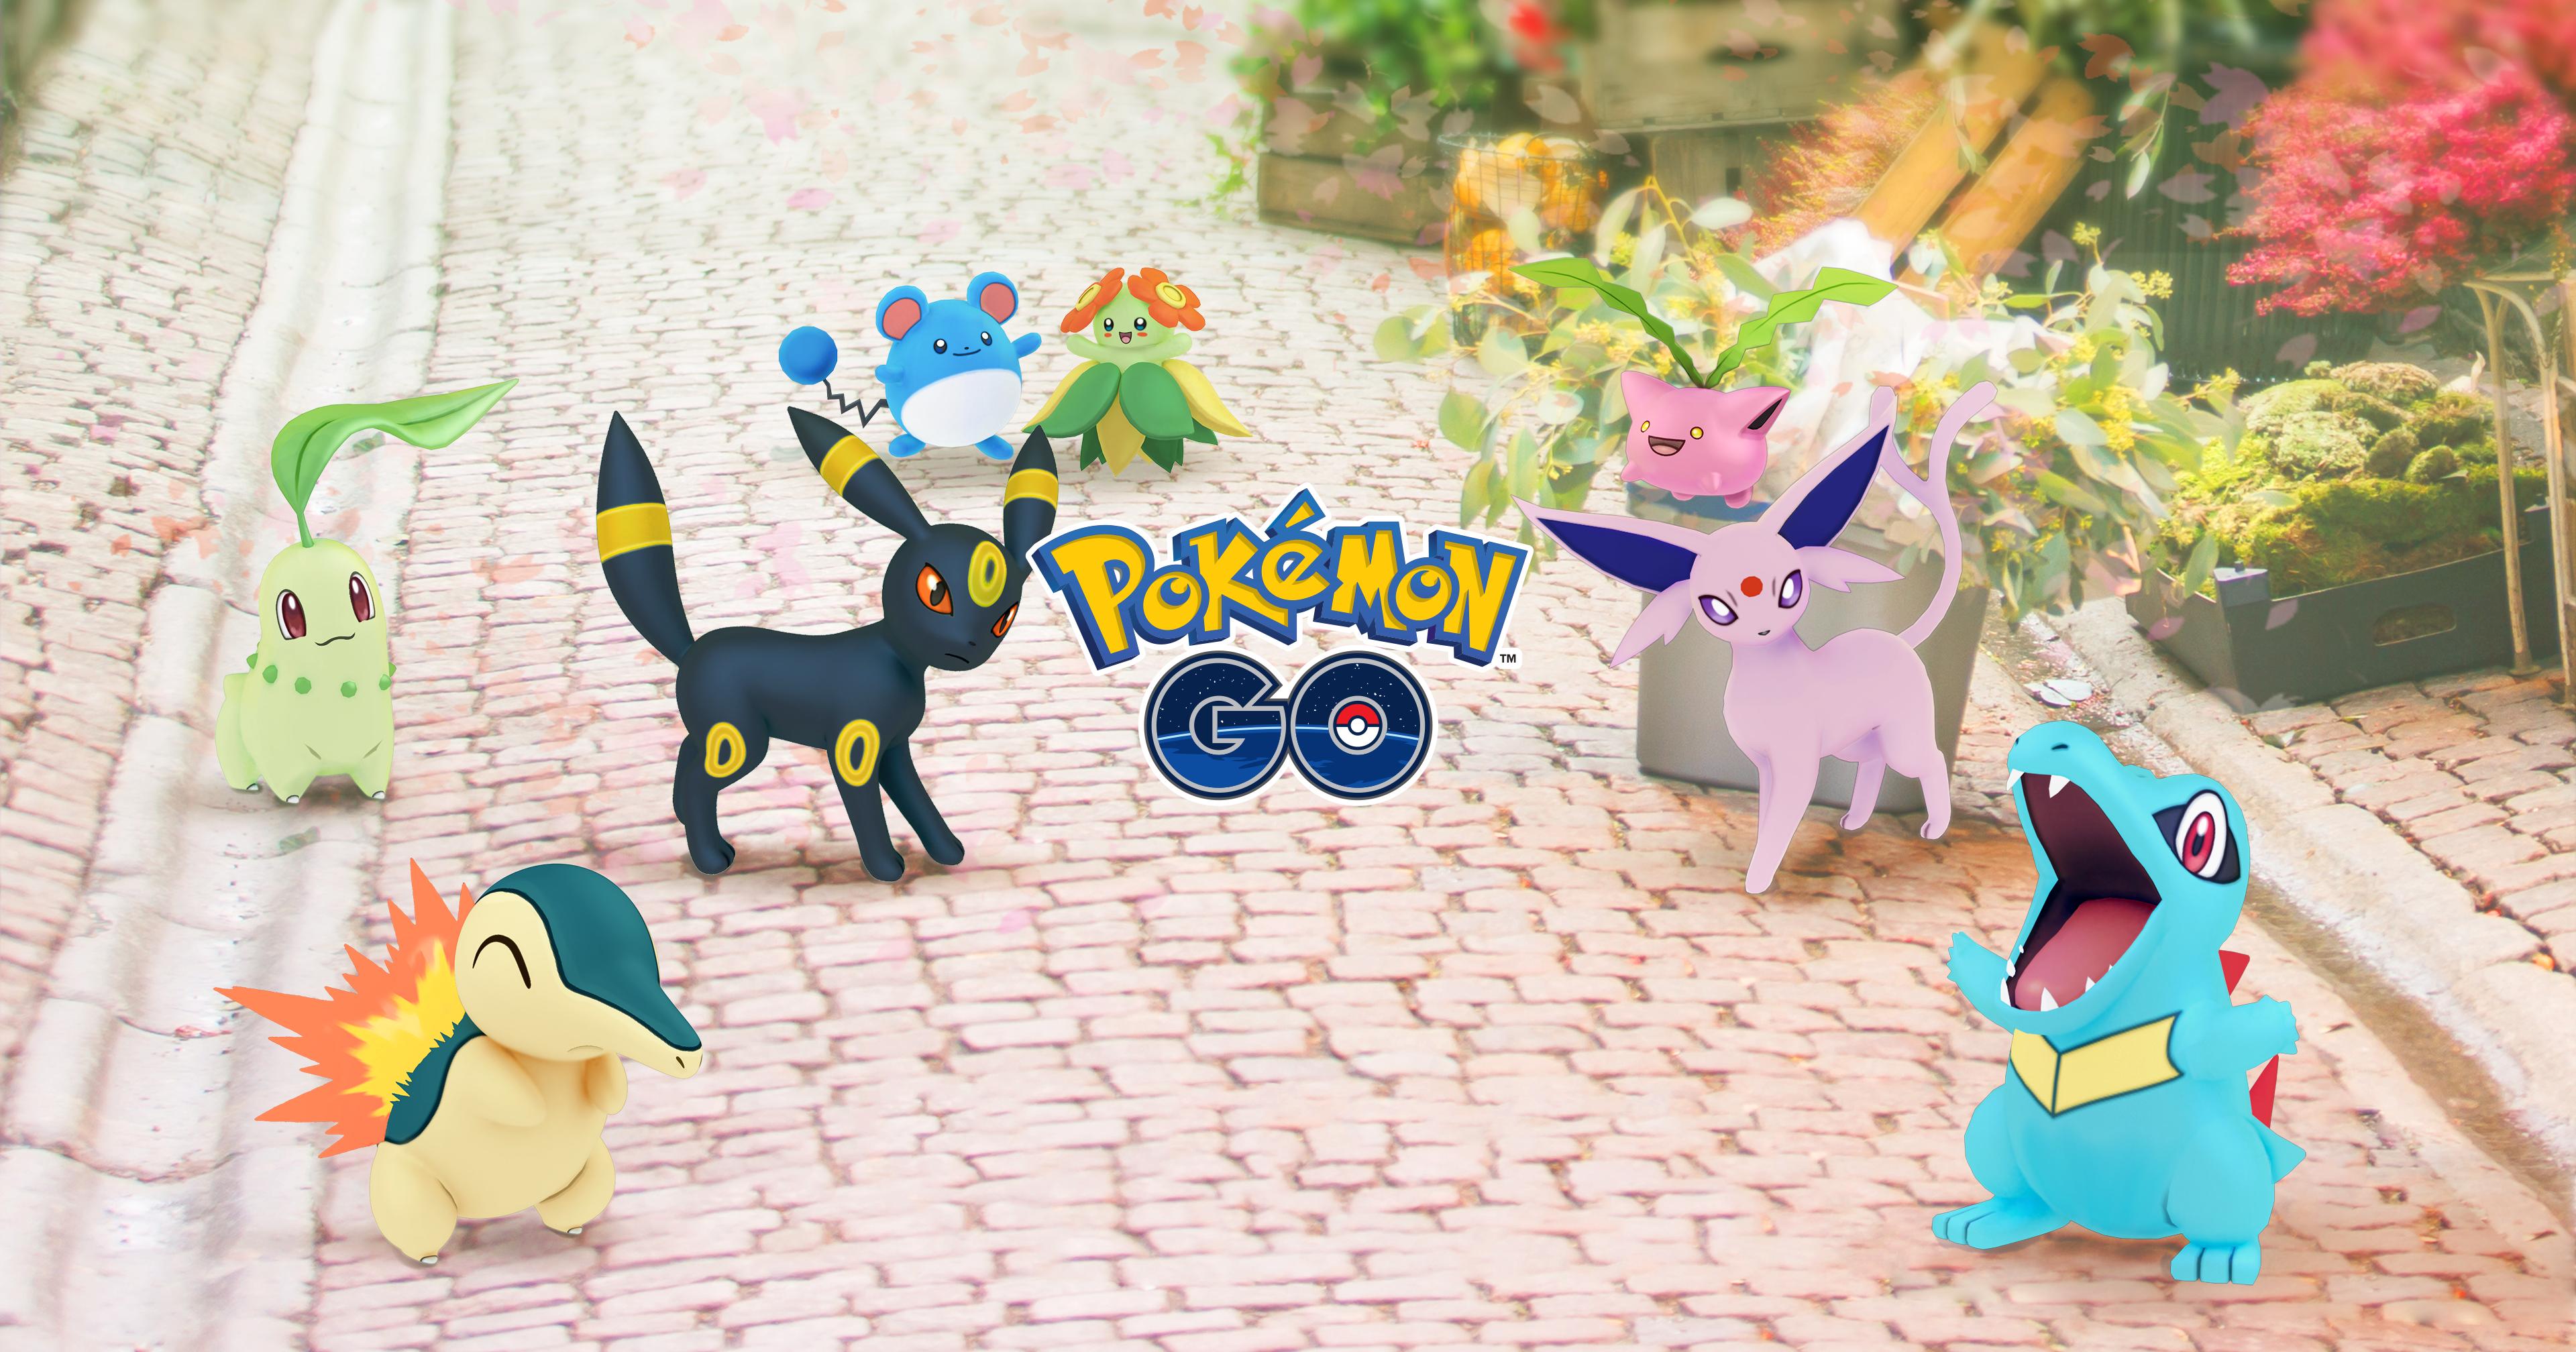 Johto Pokemon GO